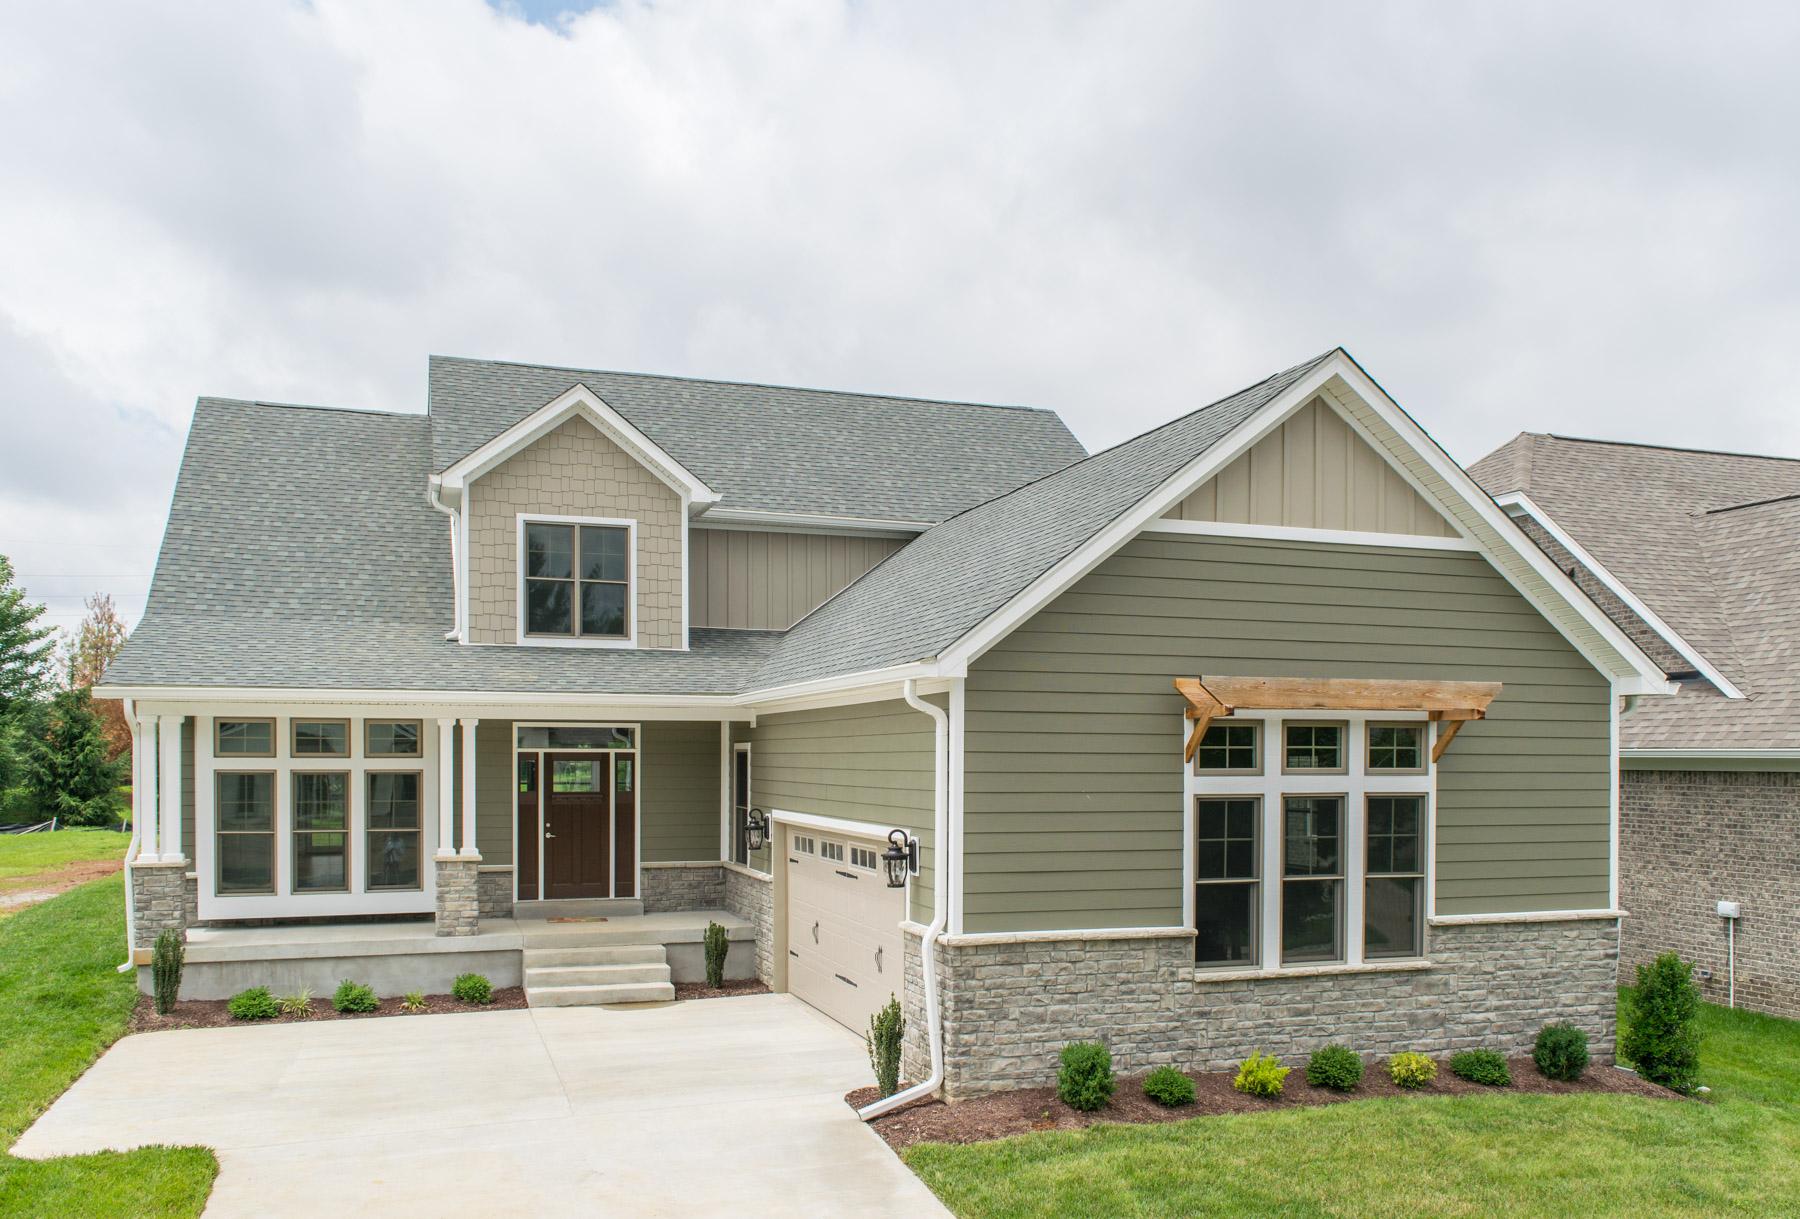 Property For Sale at 7808 Springfarm Pointe Place